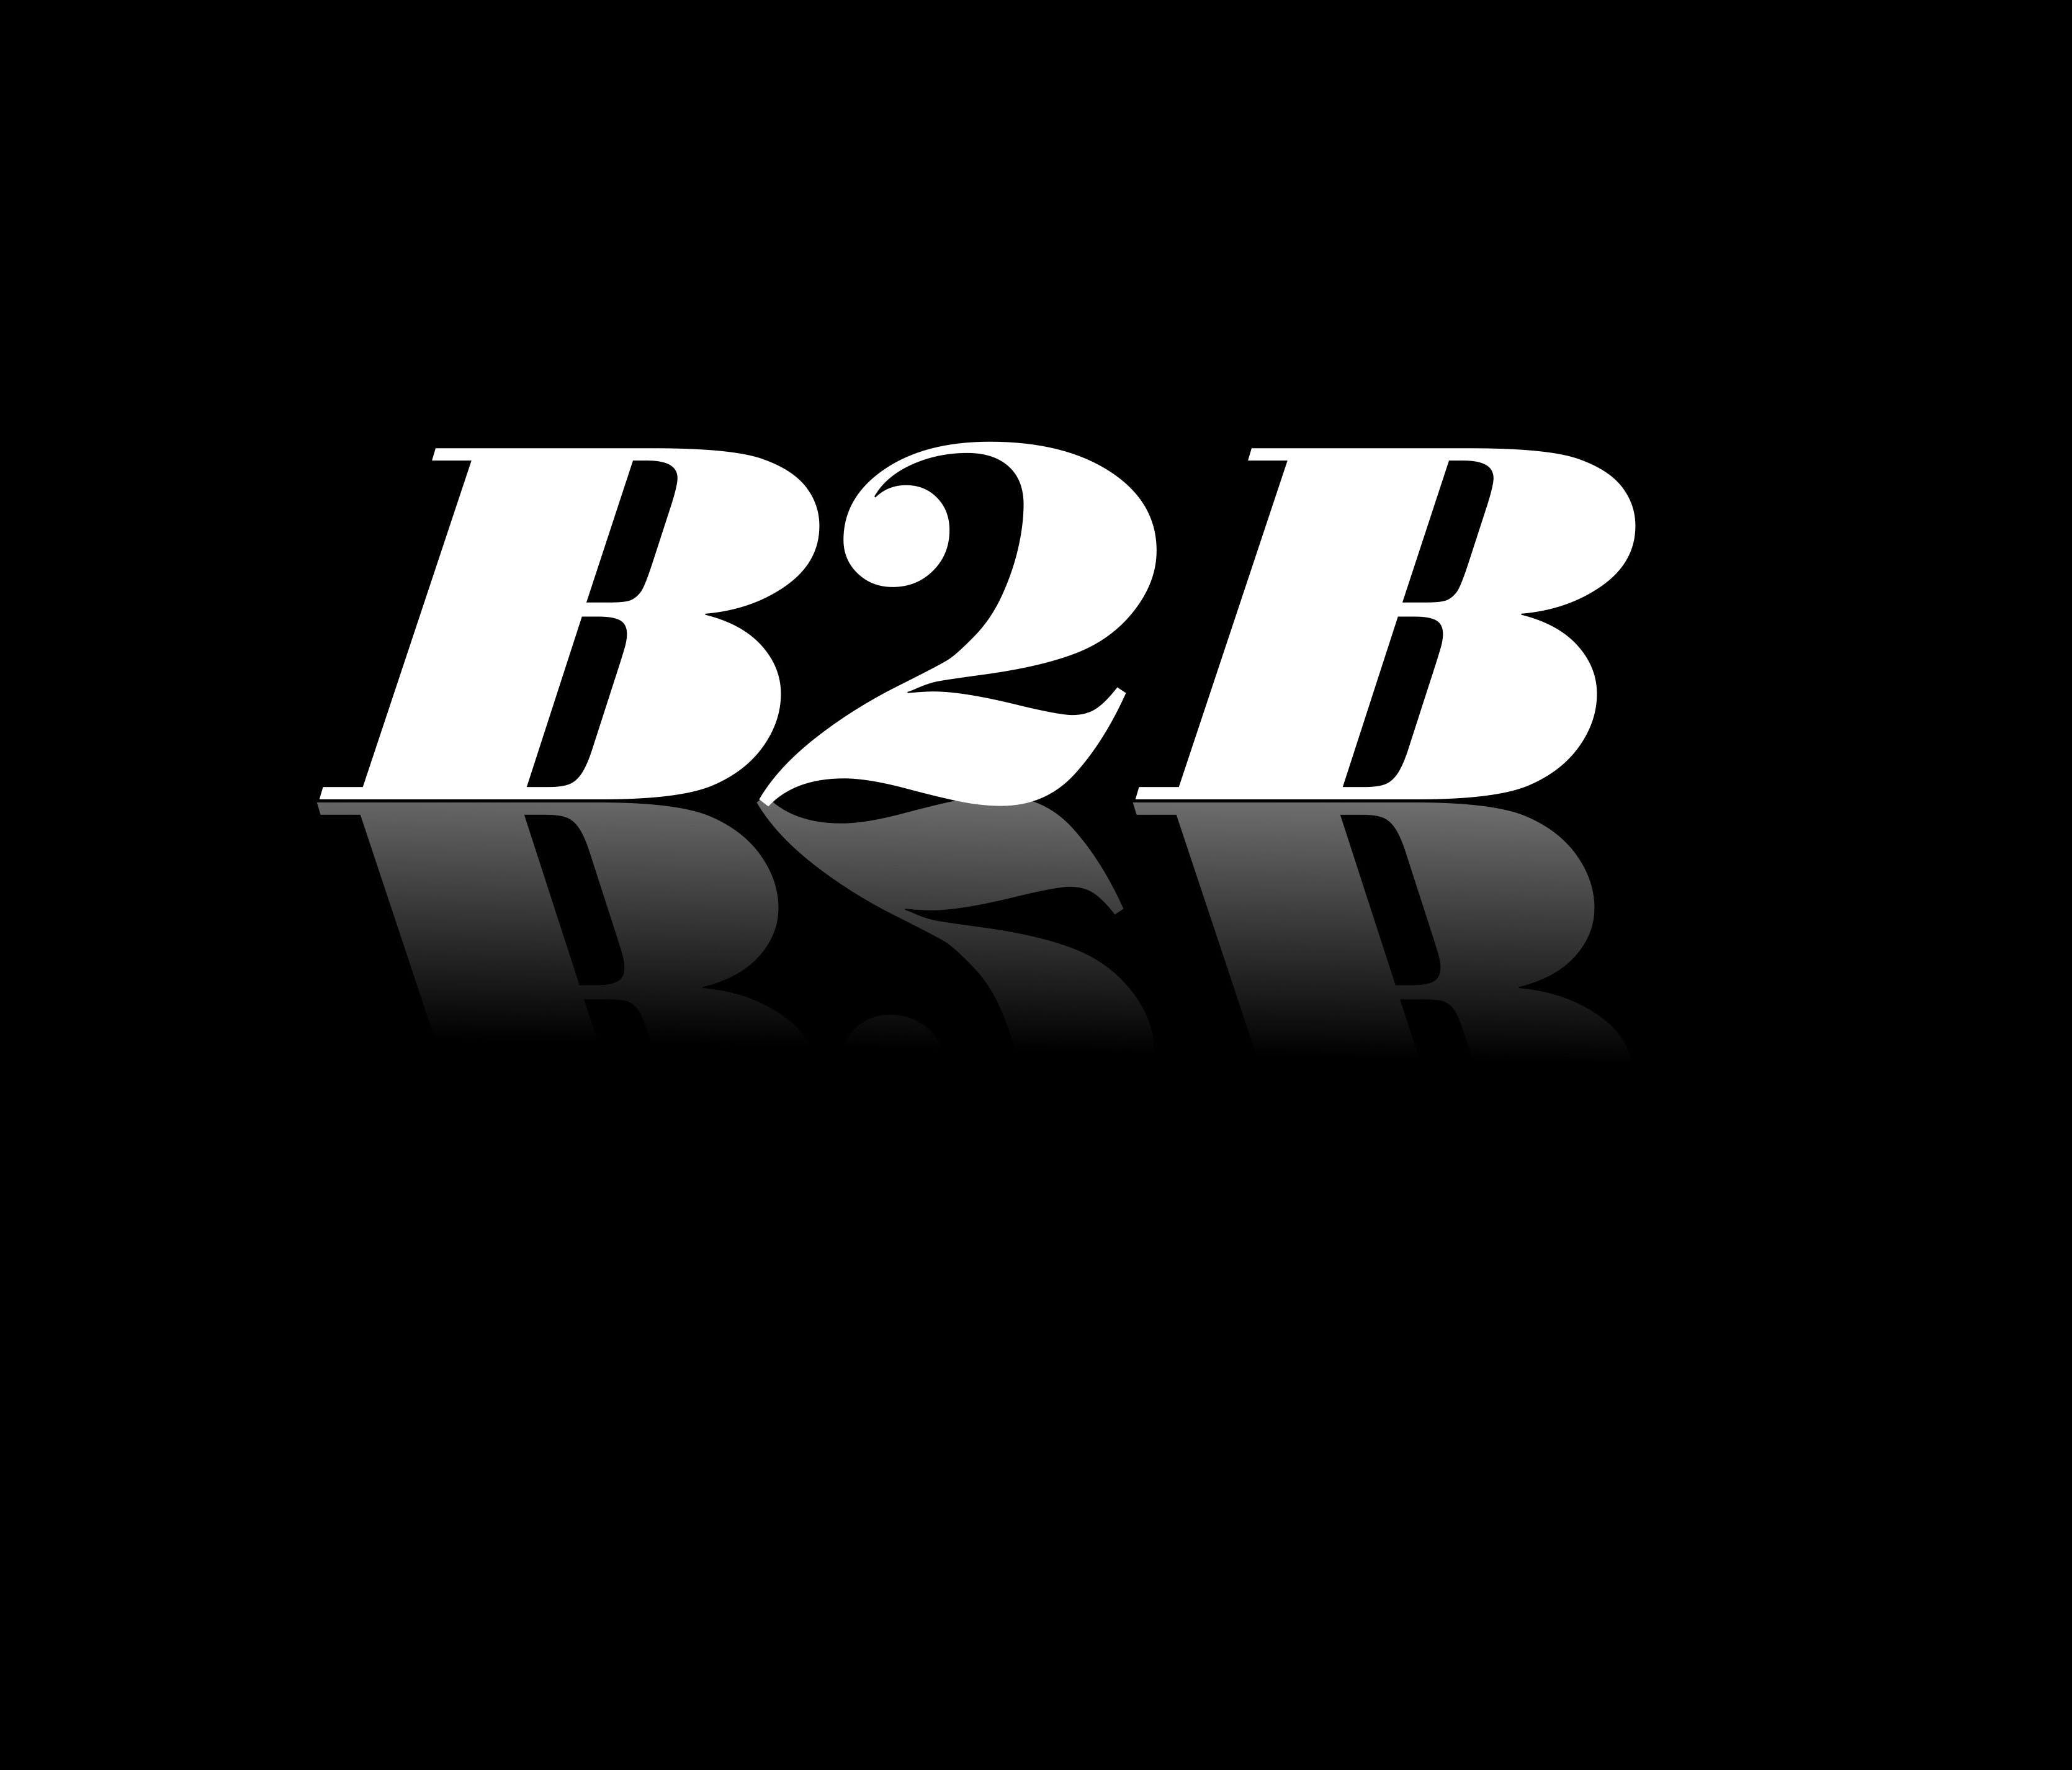 B2B illustration text